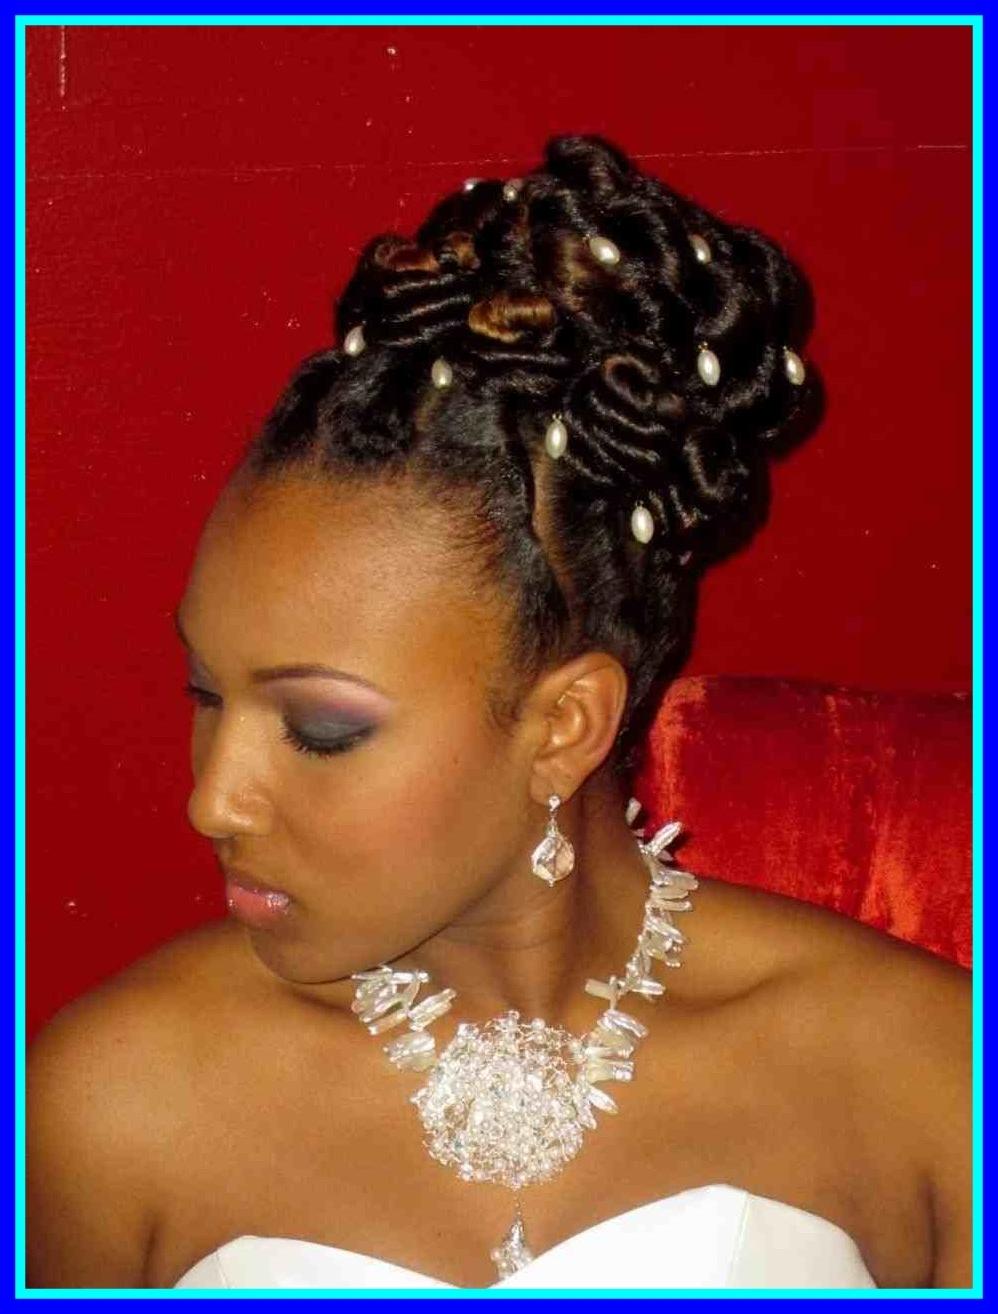 Inspiring Wedding Hairstyles For Black Bridesmaids The Big River With 2018 Wedding Hairstyles With Braids For Black Bridesmaids (View 3 of 15)